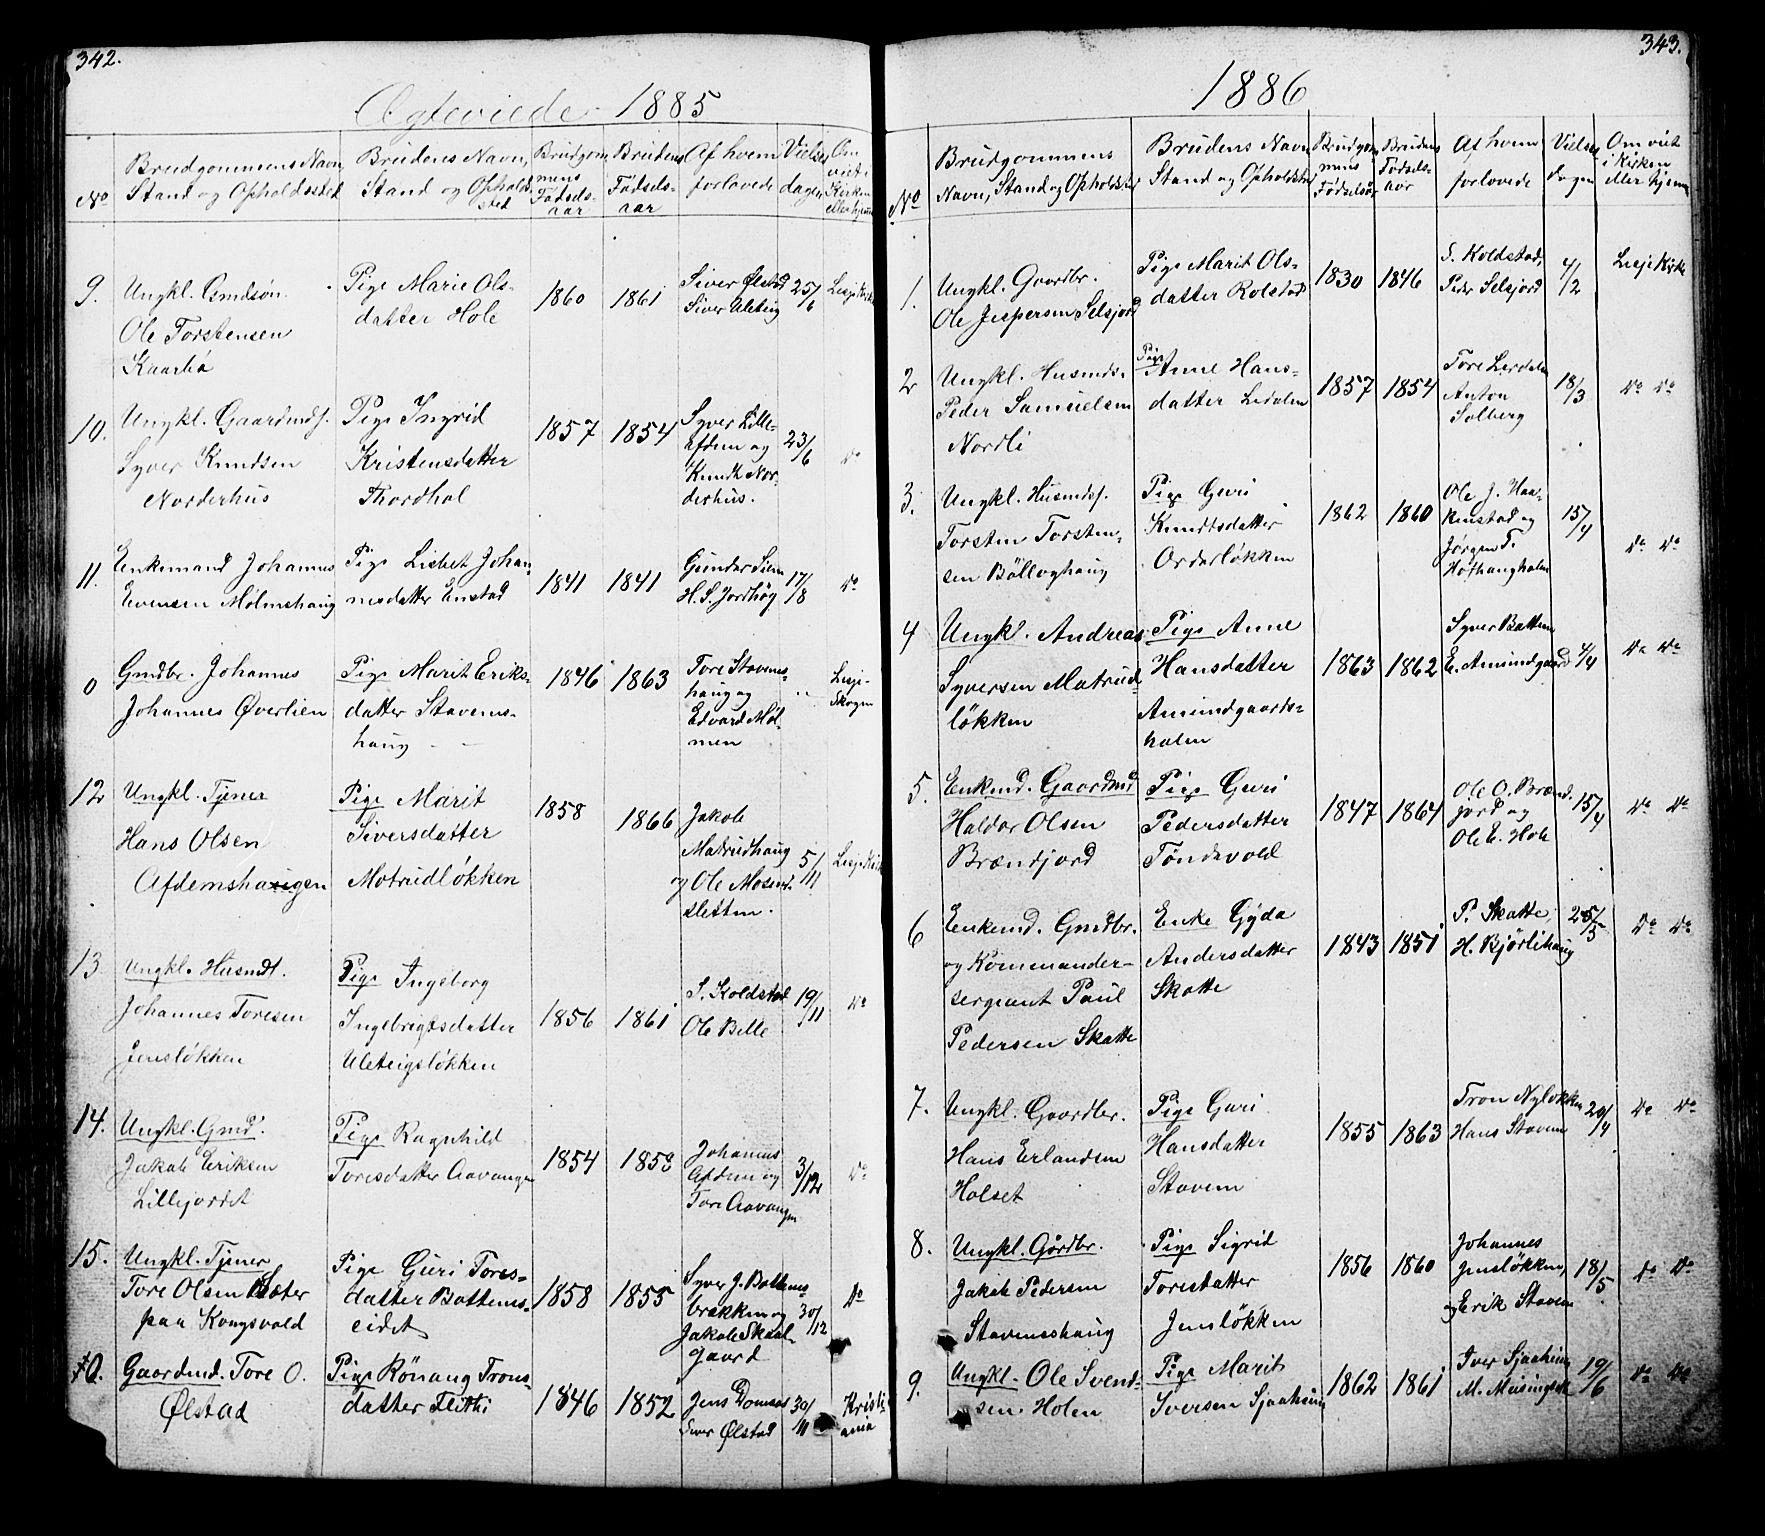 SAH, Lesja prestekontor, Klokkerbok nr. 5, 1850-1894, s. 342-343